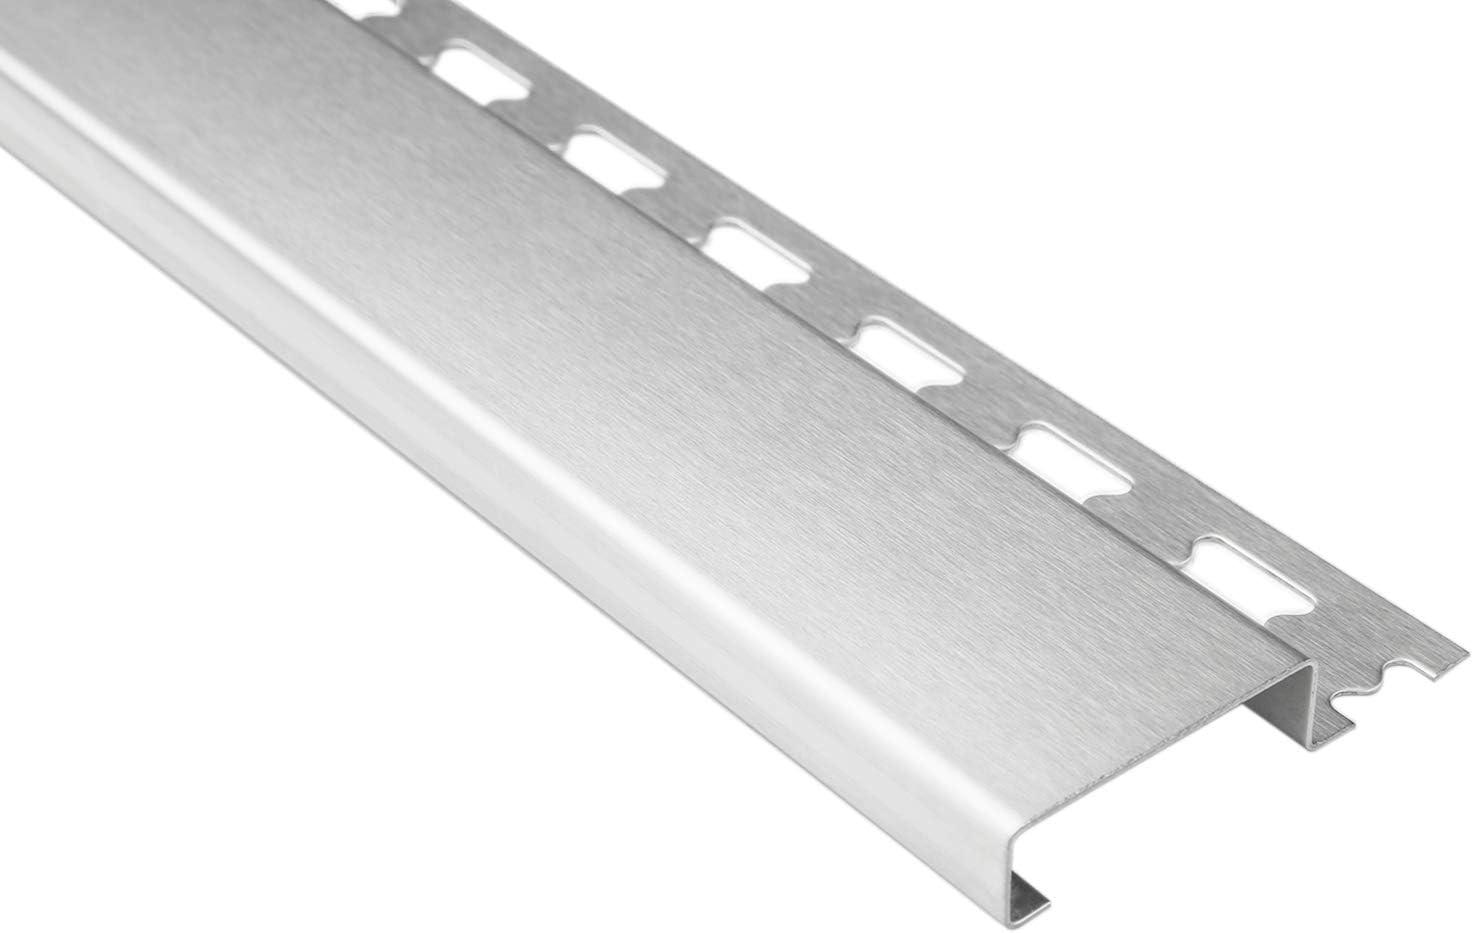 Sockelprofil V2A Edelstahl HEX940 SI rostfrei 2 Meter 10mm